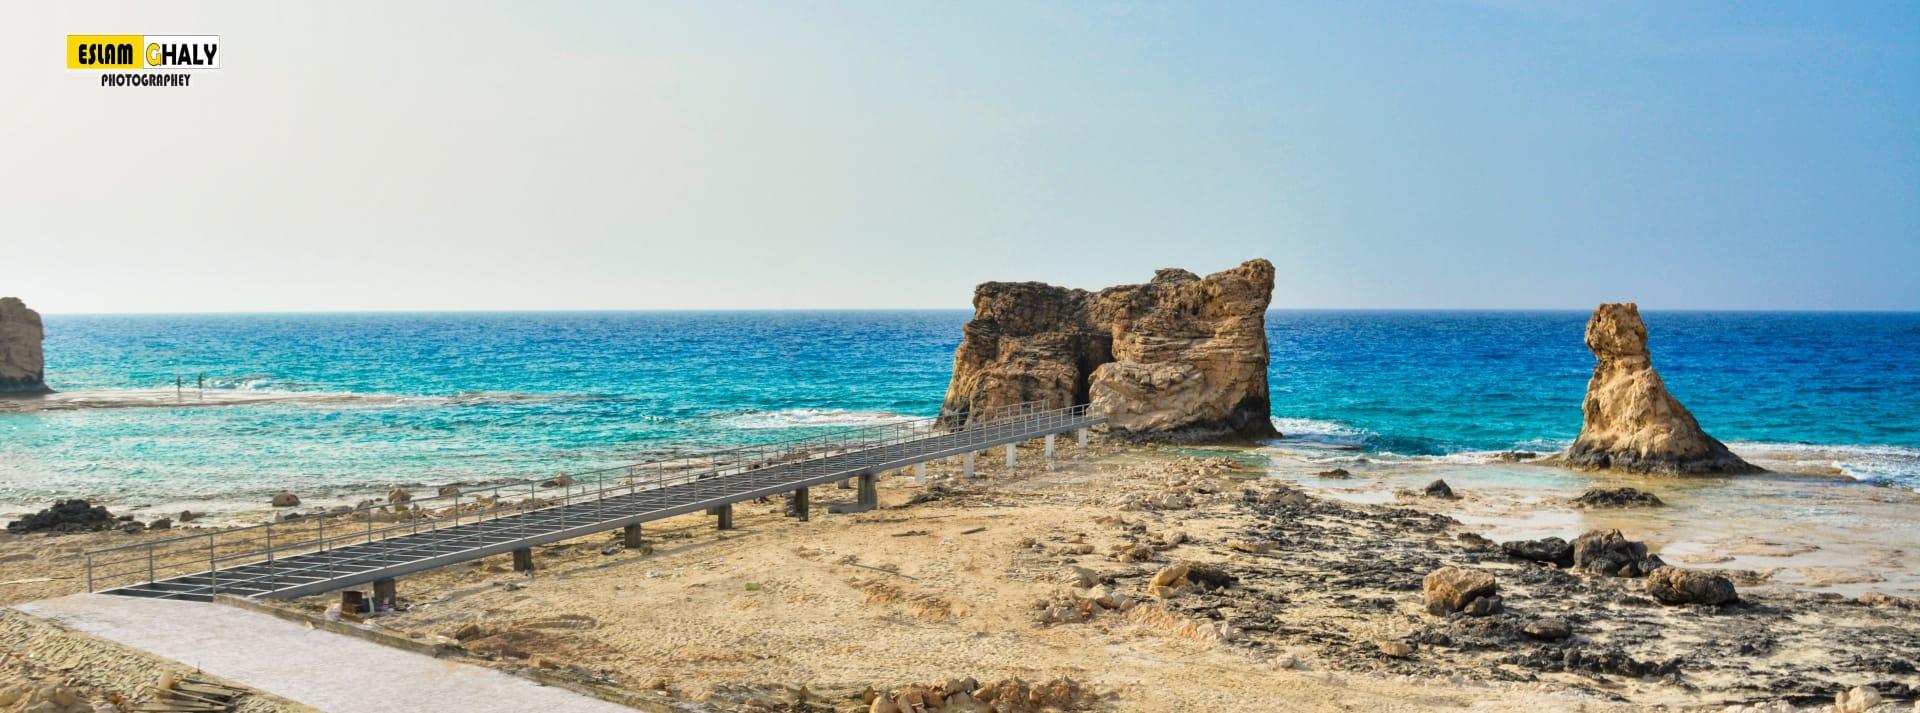 حمام كليوباترا في مصر